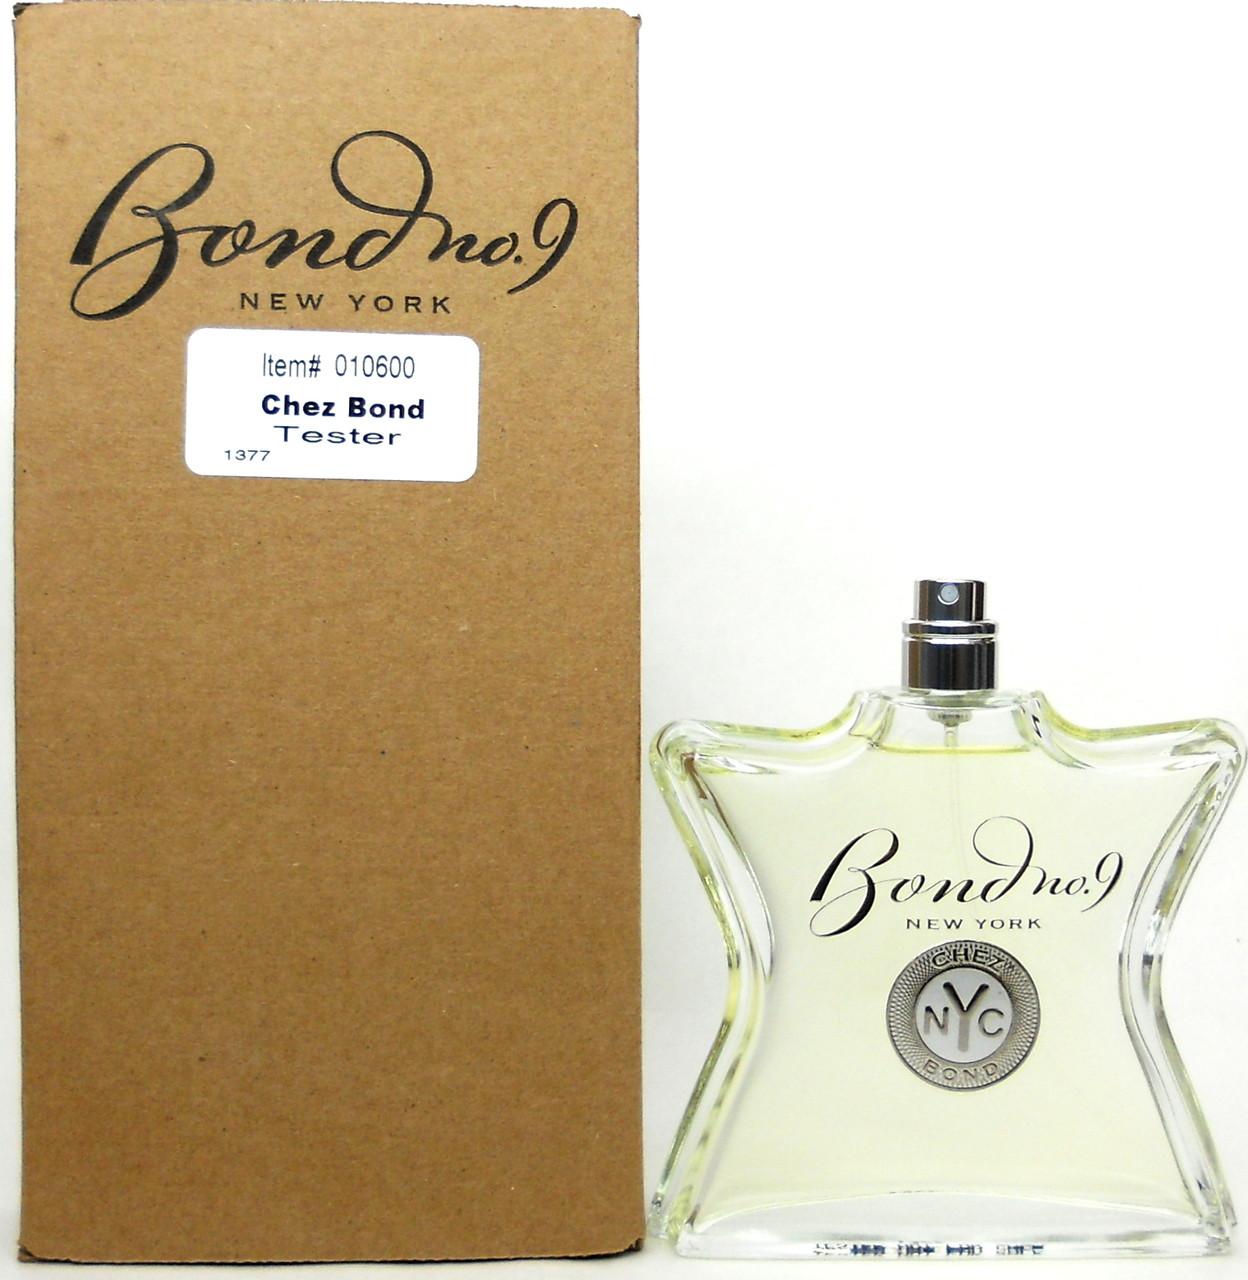 Bond No 9 Chez 33 Oz Eau De Perfum Spray Unisex Tester New Queen Edp 100ml Image 1